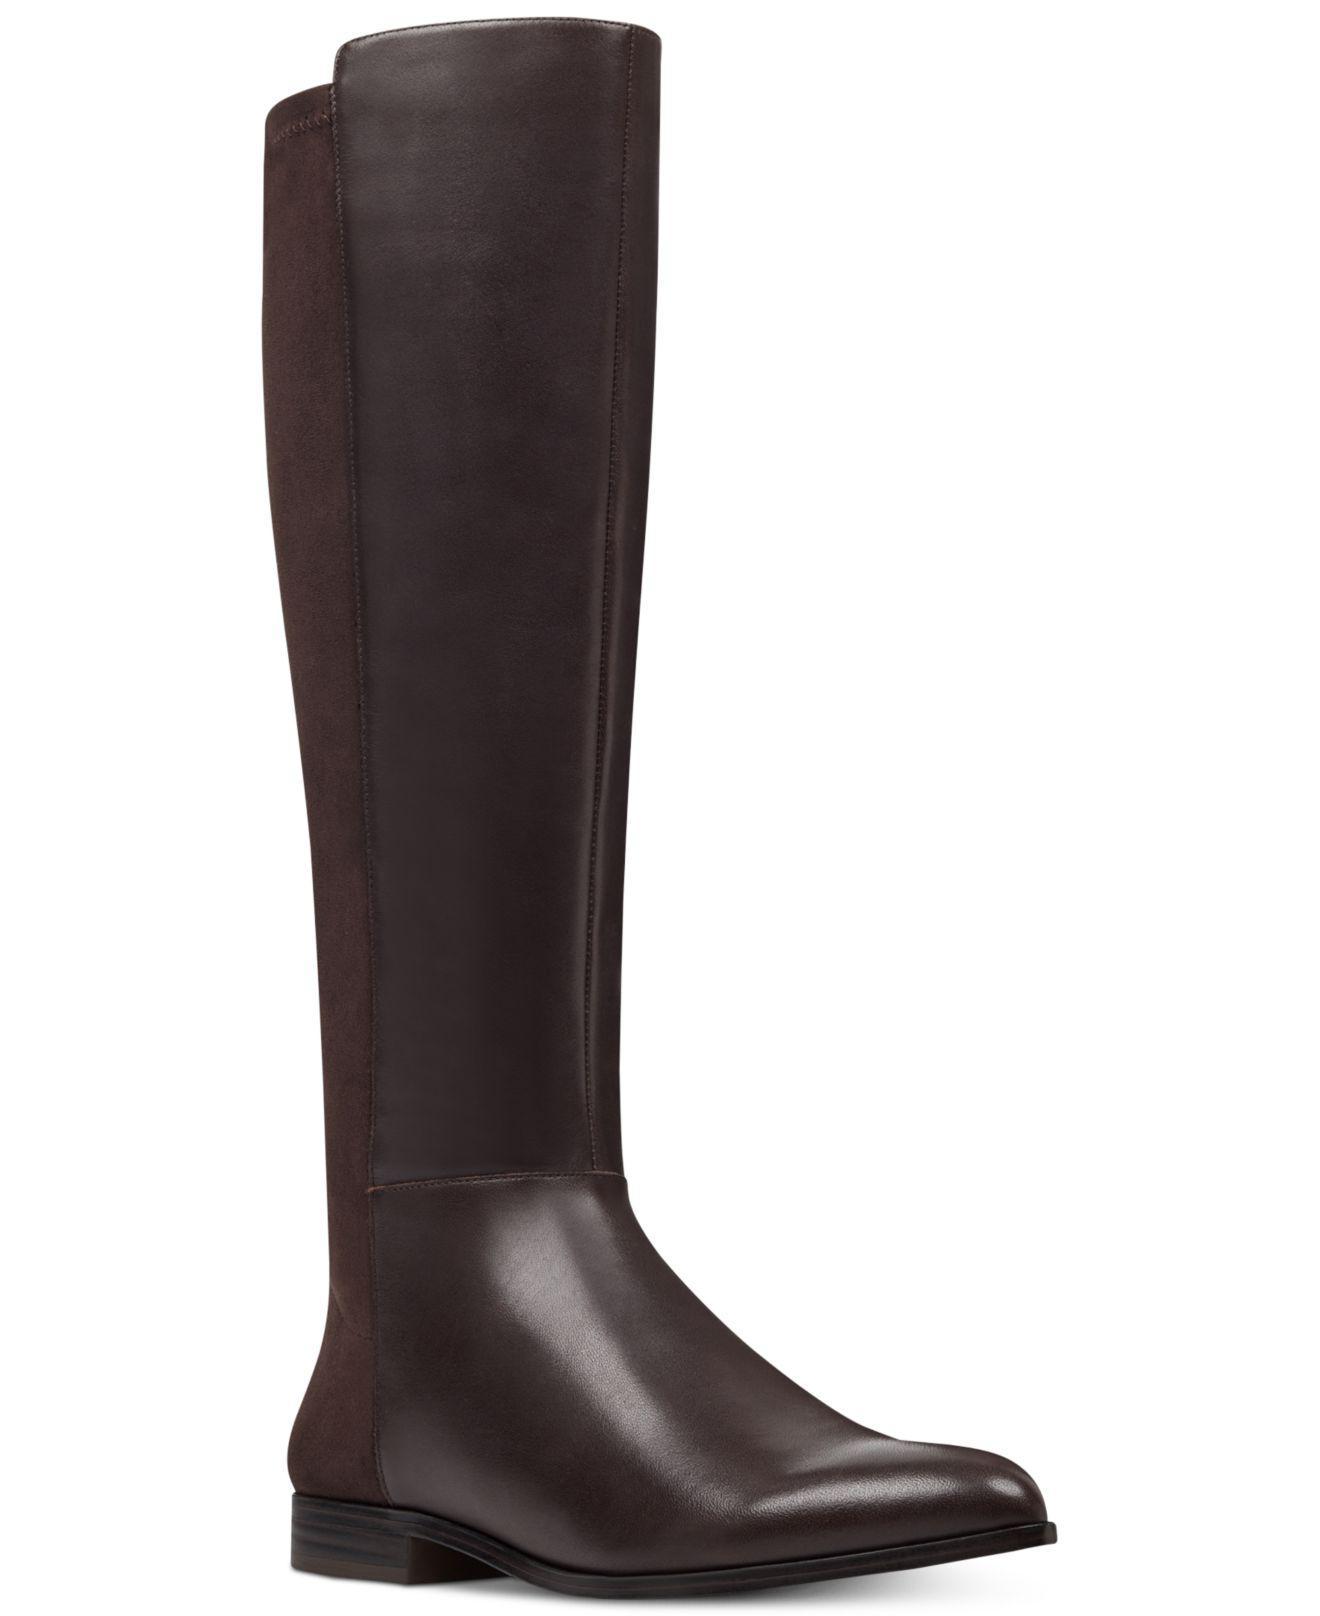 bdf5261c3ce9 Lyst - Nine West Owenford Wide Calf Stretch Back Boots in Brown ...